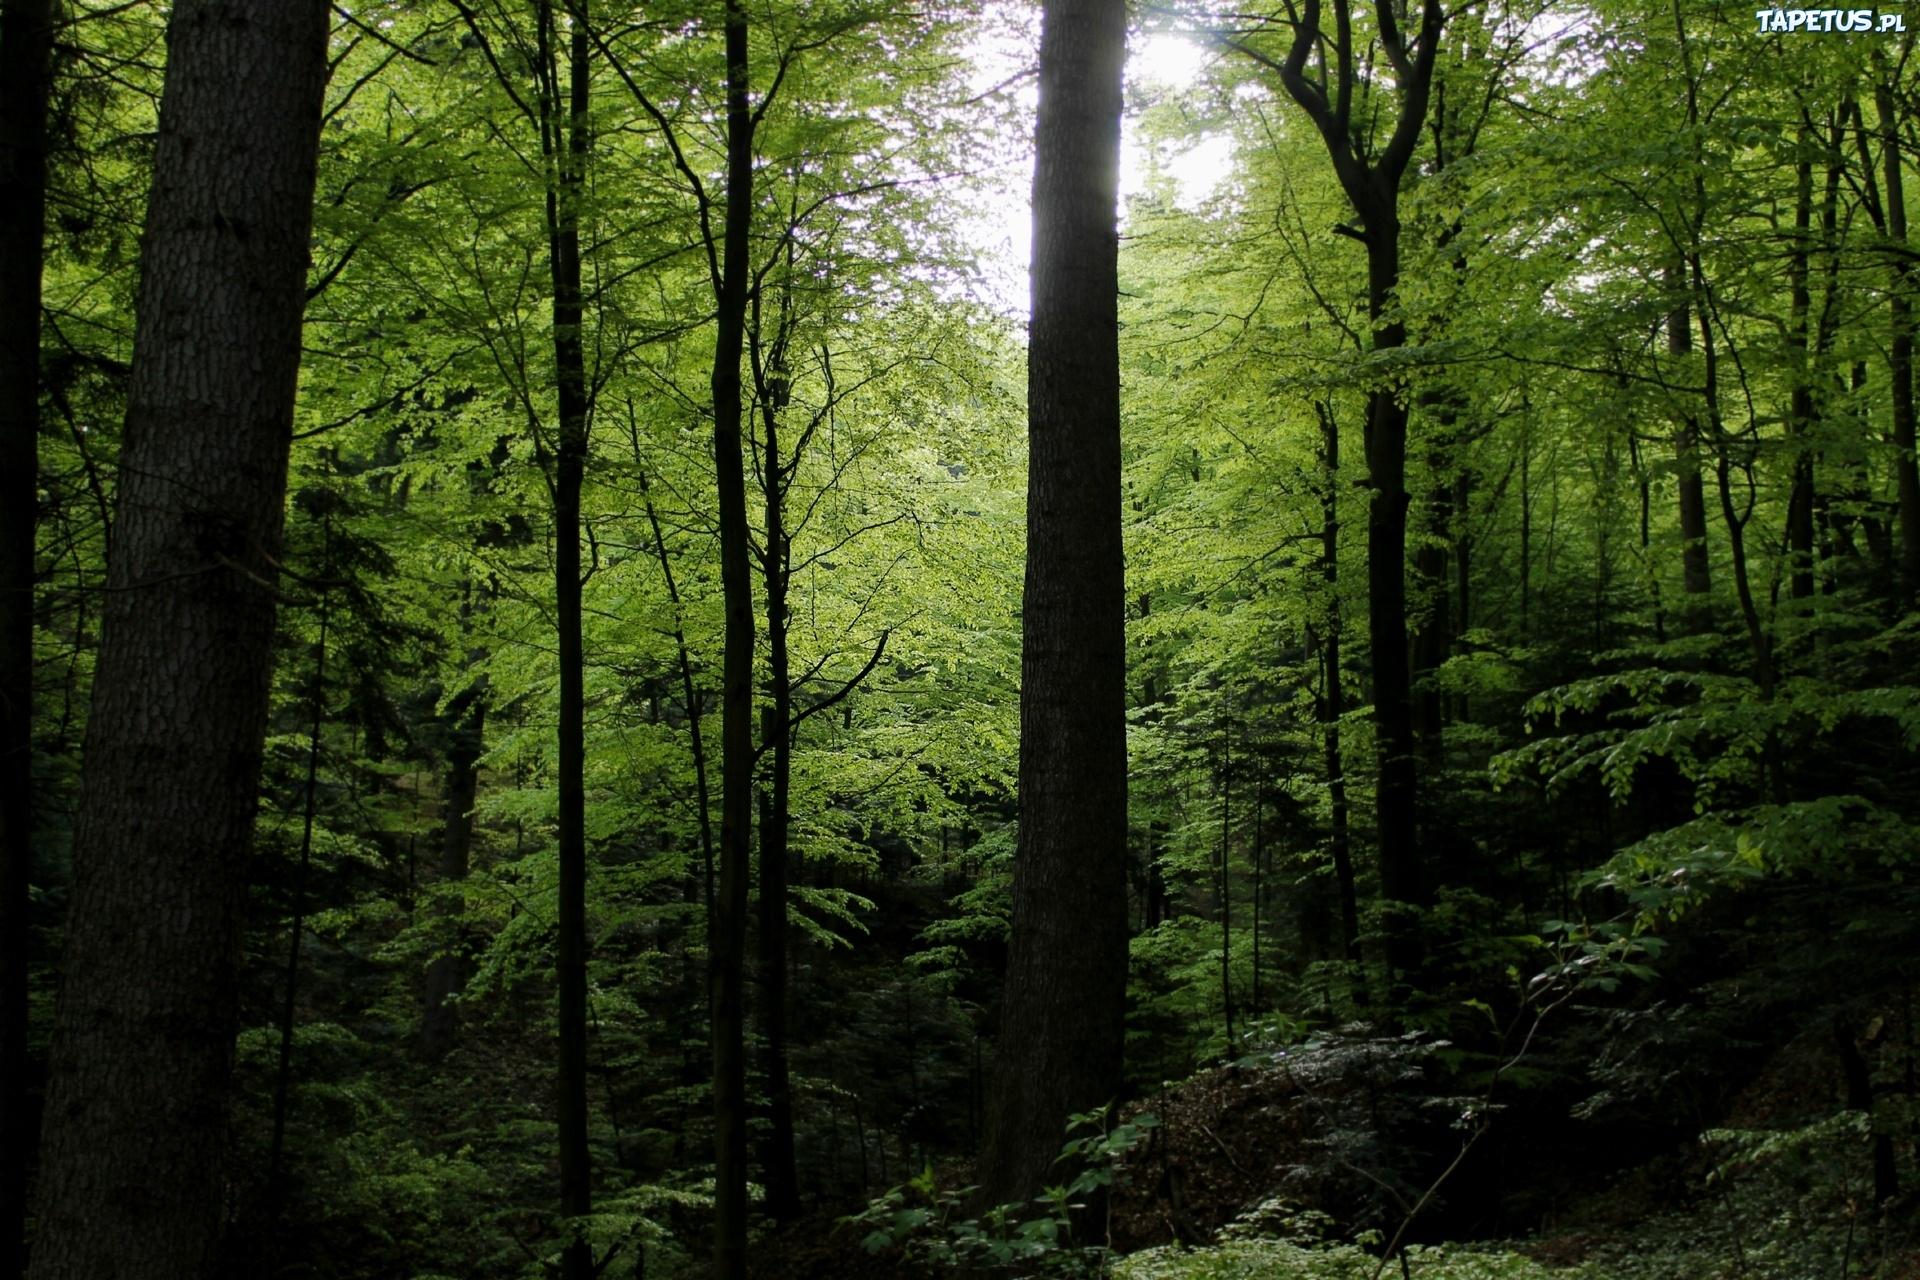 Tapety Wiosna - Tapety wiosenne - darmowe tapety na pulpit